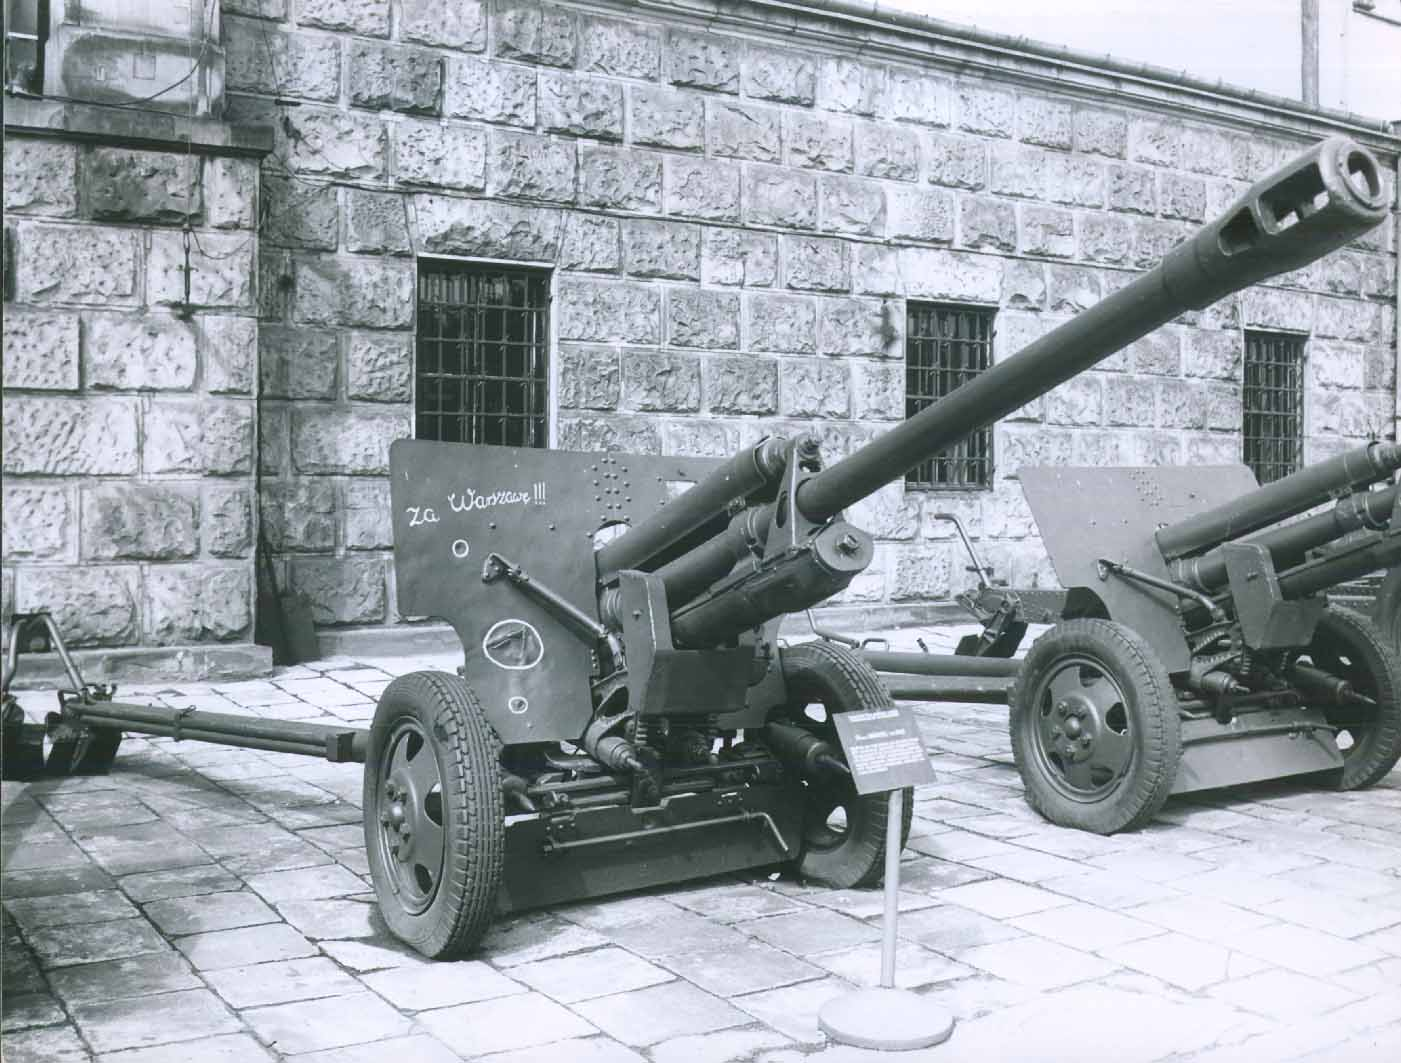 Armata dywizyjna wzór 1942 (ZIS-3) kal. 76,2 mm